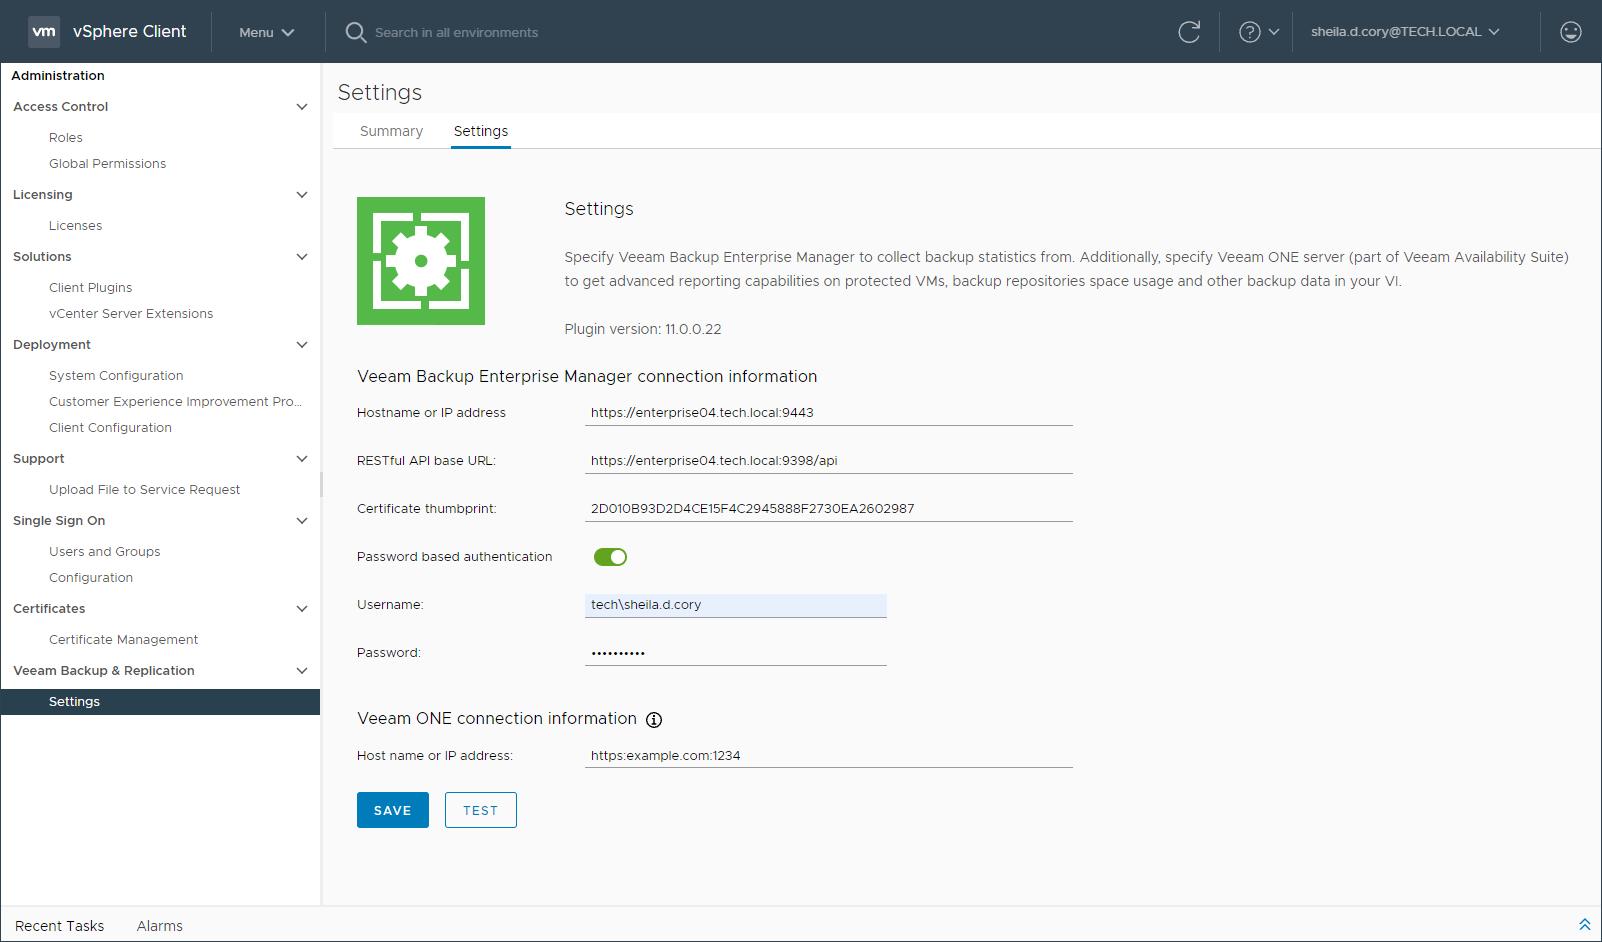 Configuring Plug-in Settings - Veeam Backup Enterprise